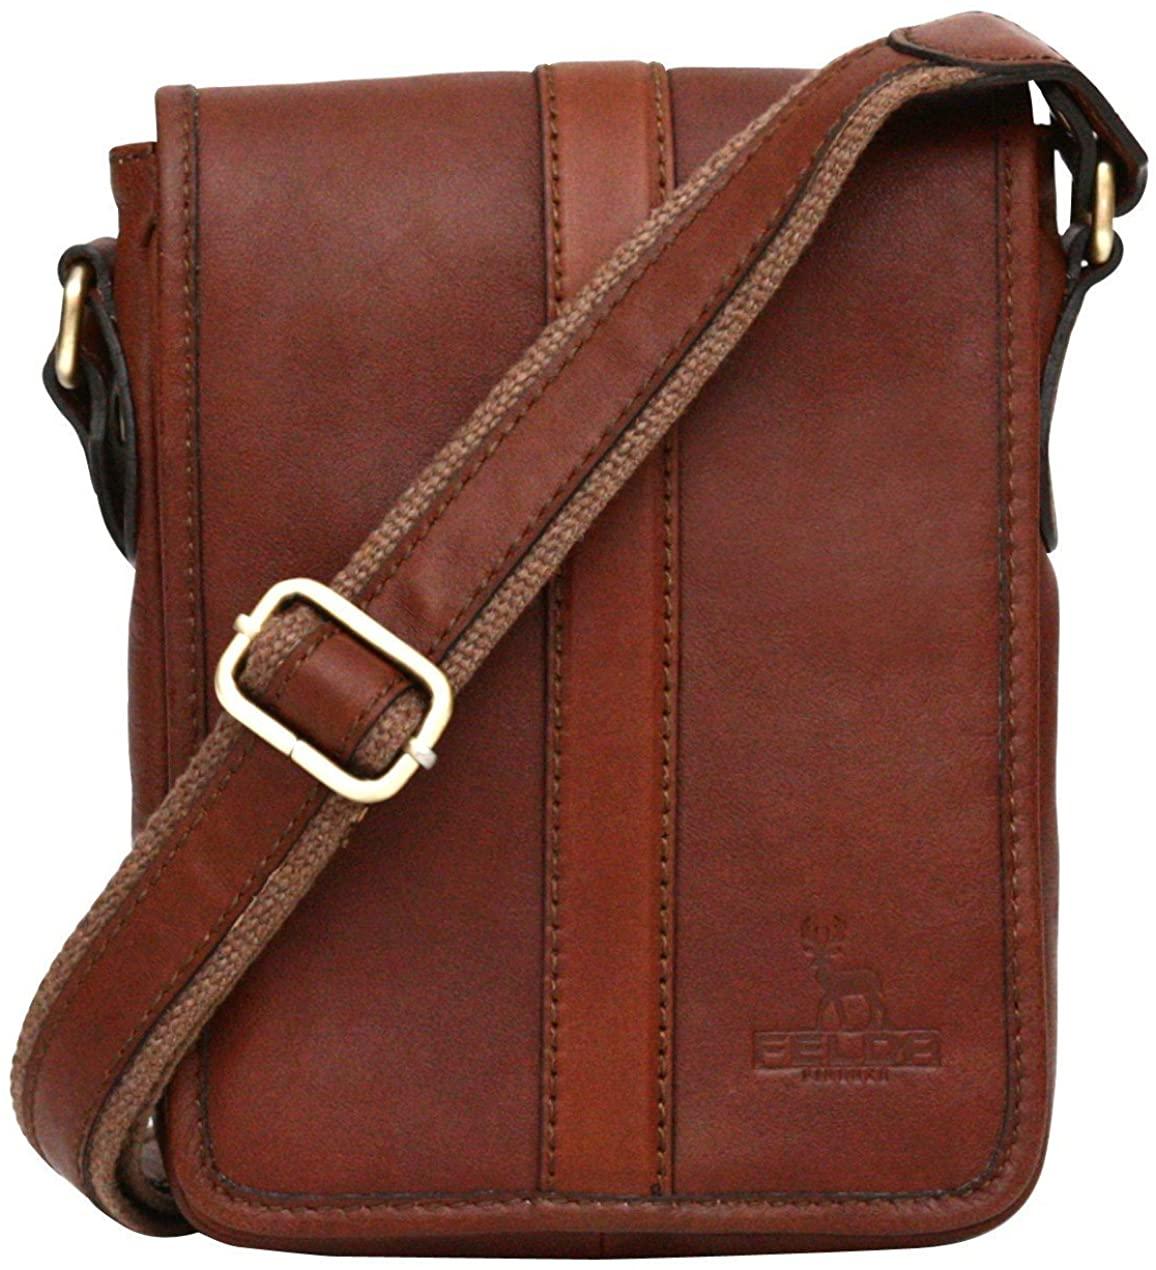 Genuine Leather Small Side Shoulder Bag Unisex Case Carry